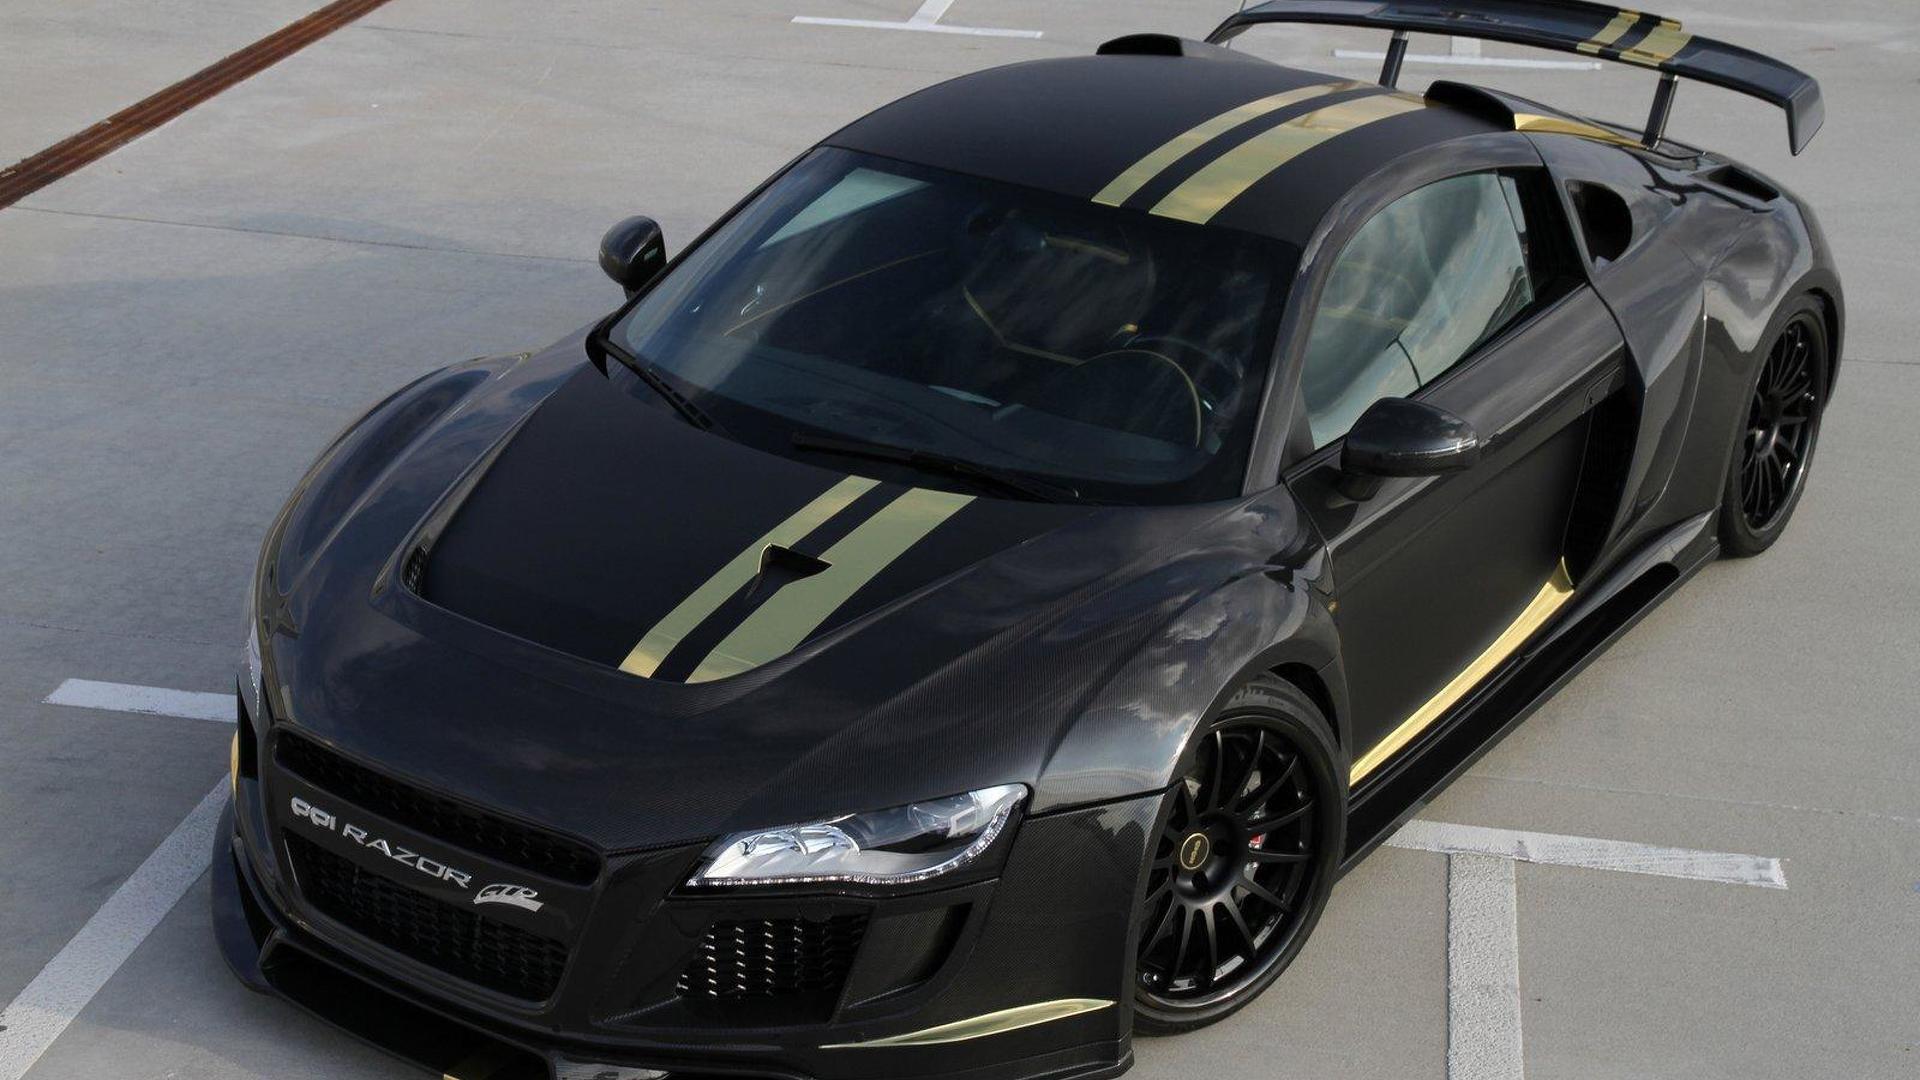 PPI RAZOR GTR-10 Limited Edition announced